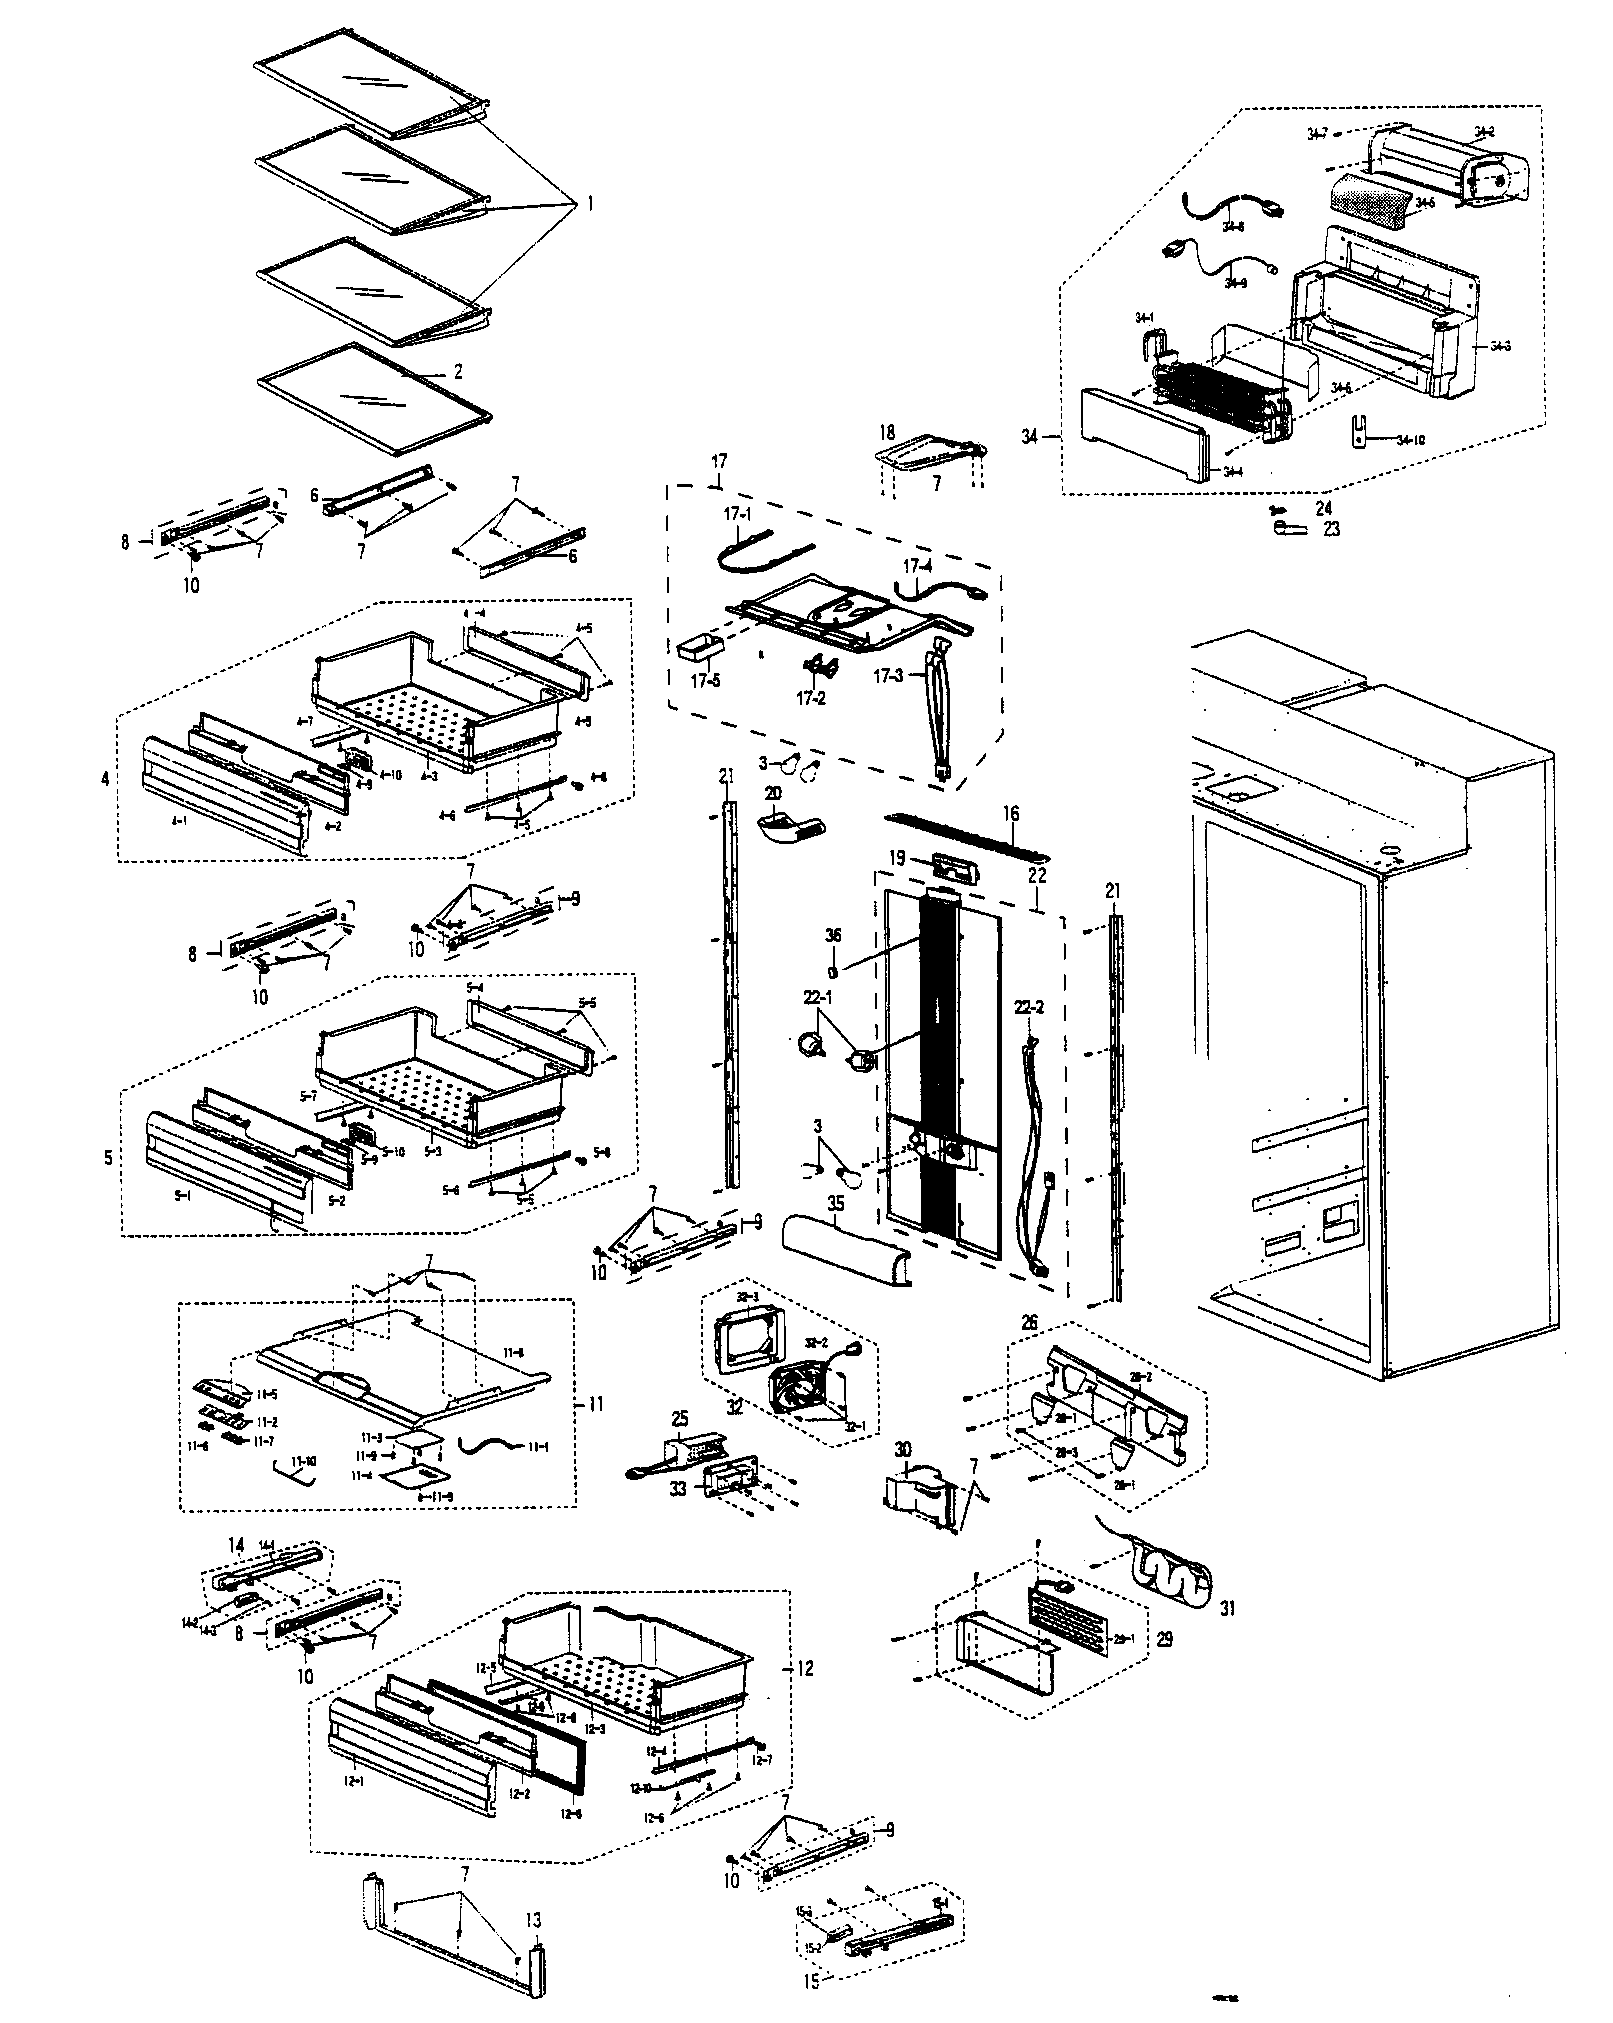 REFRIGERATOR ROOM Diagram & Parts List for Model